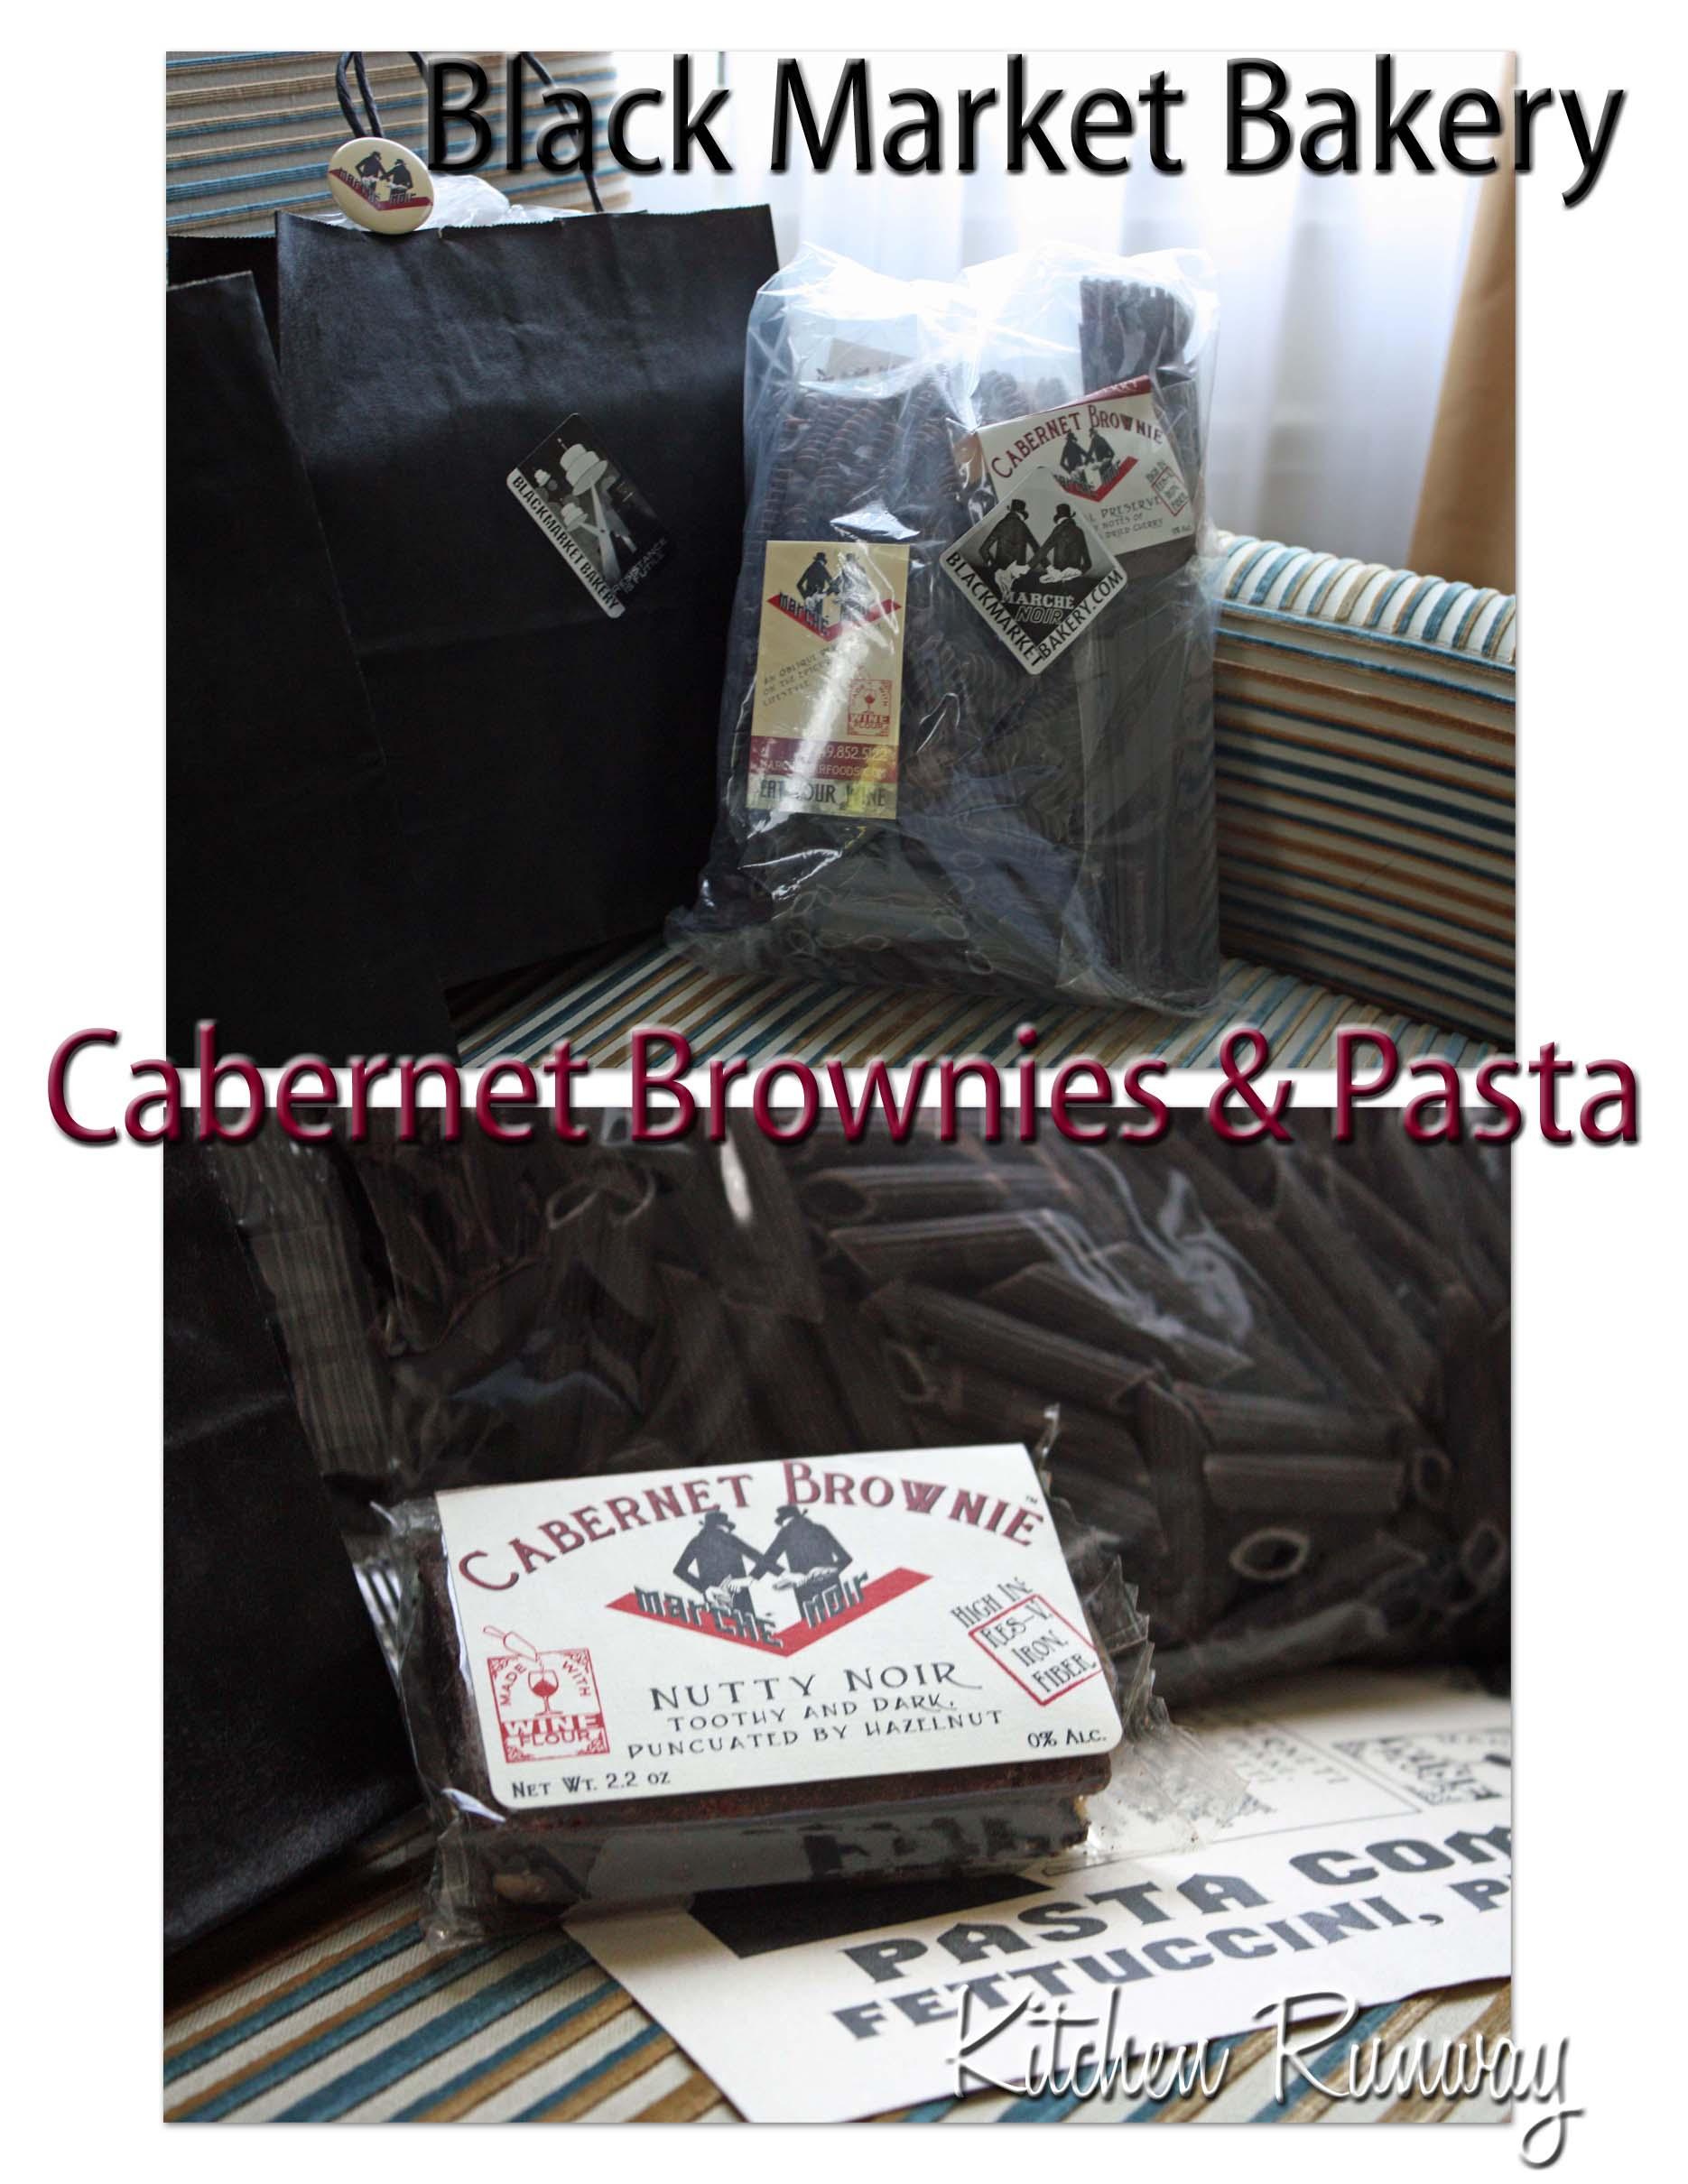 black market bakery cabernet brownie & pasta